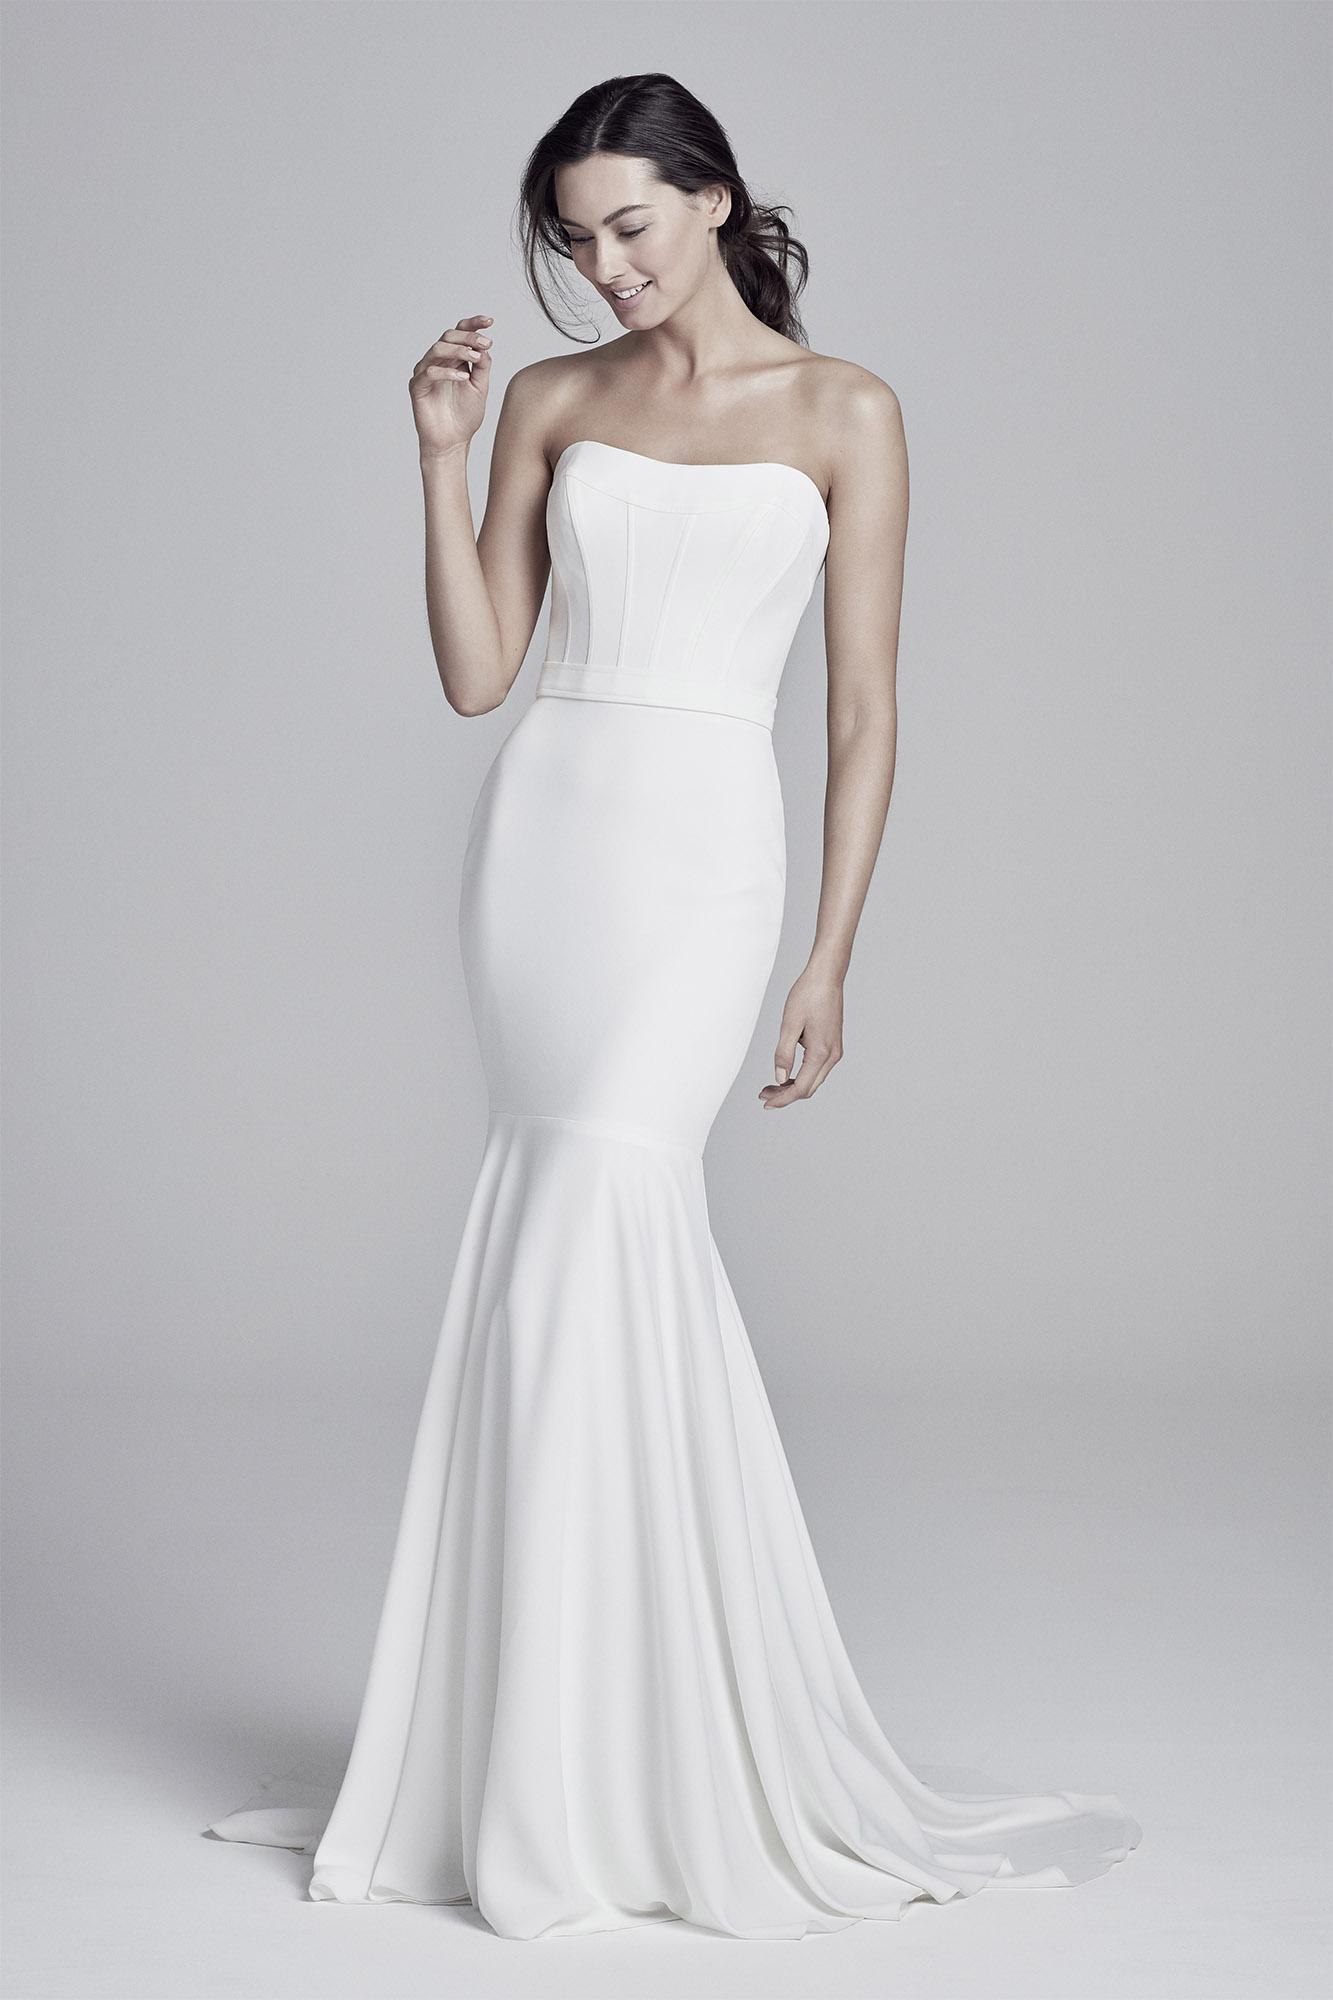 Selene | Lookbook Collection 2019 | designer wedding dresses by Suzanne Neville